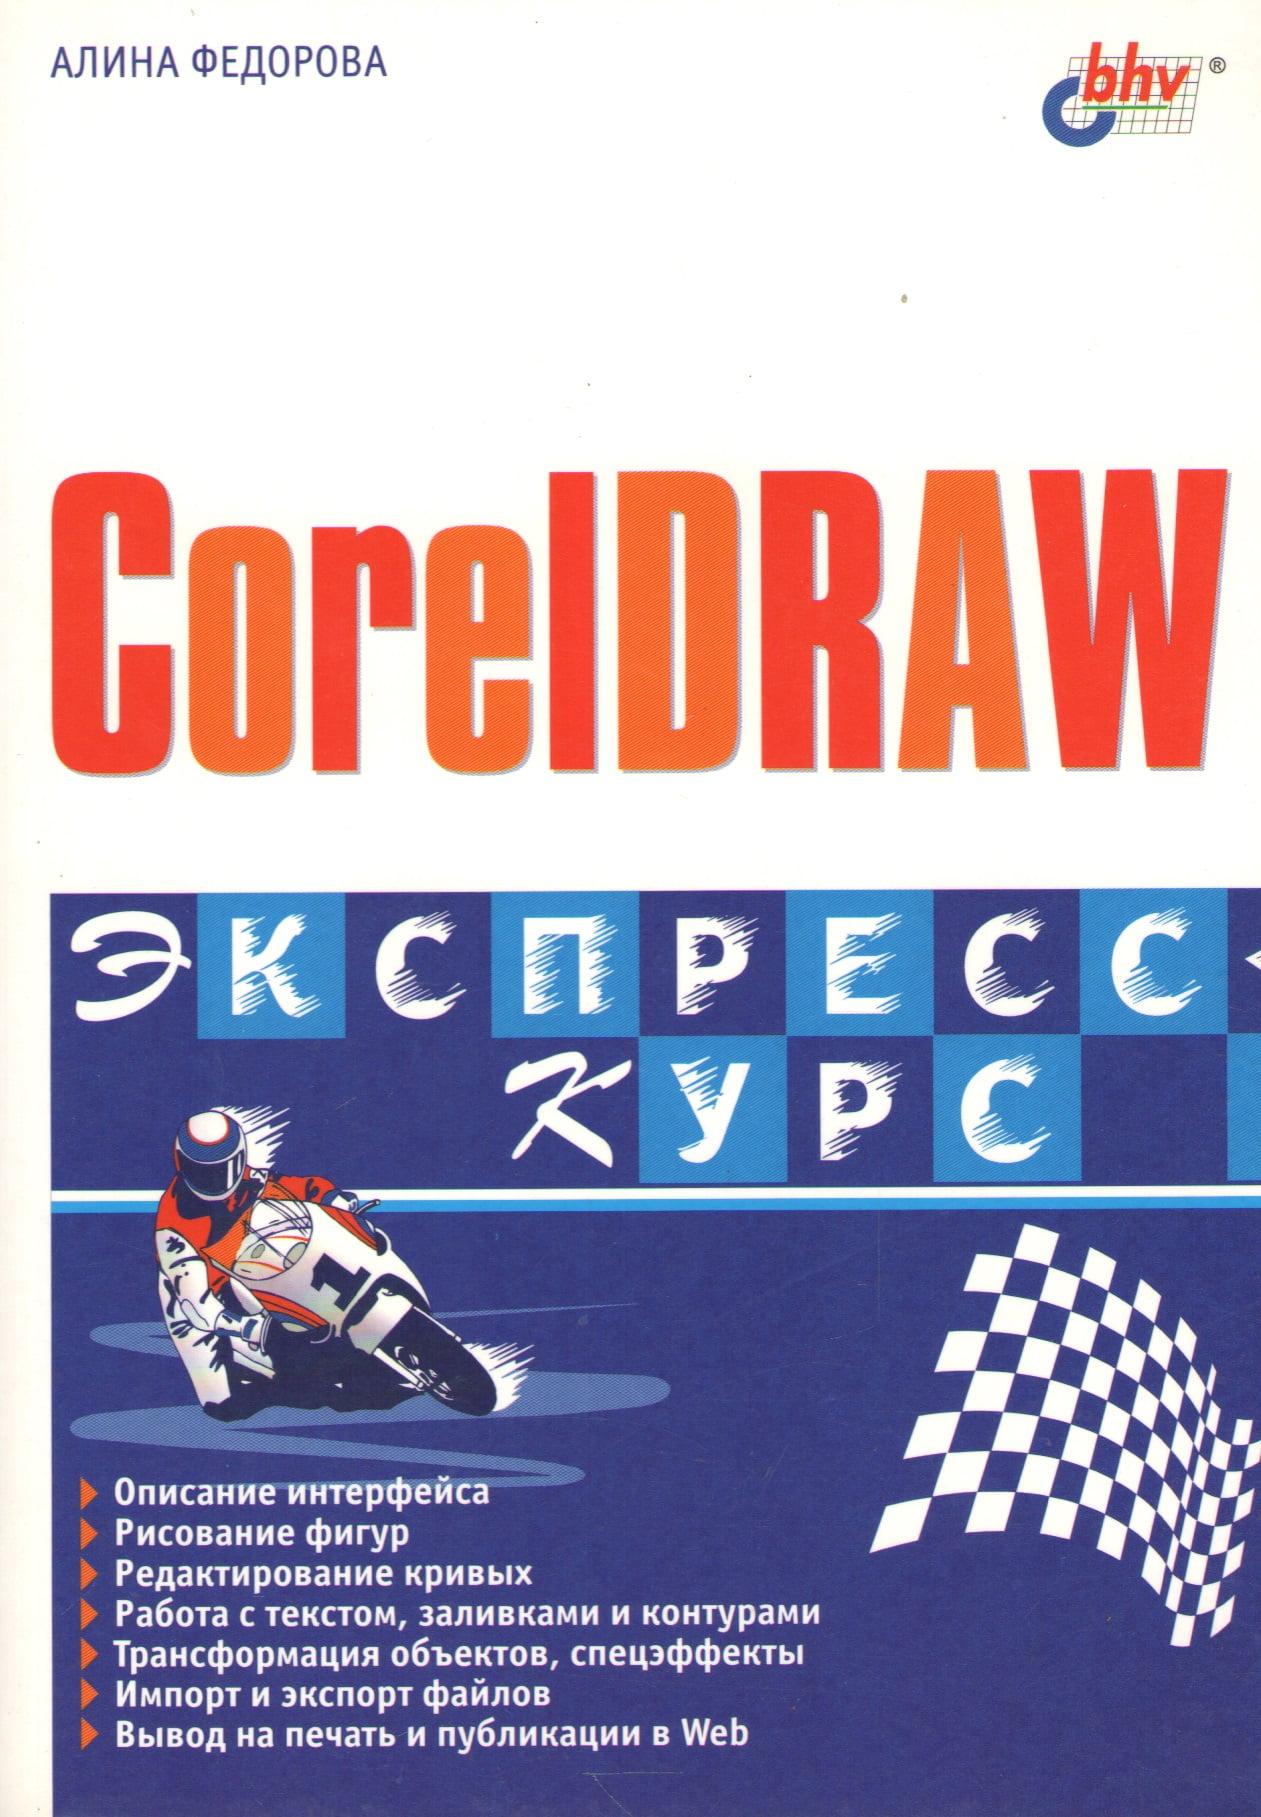 CorelDRAW.+%D0%AD%D0%BA%D1%81%D0%BF%D1%80%D0%B5%D1%81%D1%81-%D0%BA%D1%83%D1%80%D1%81 - фото 1